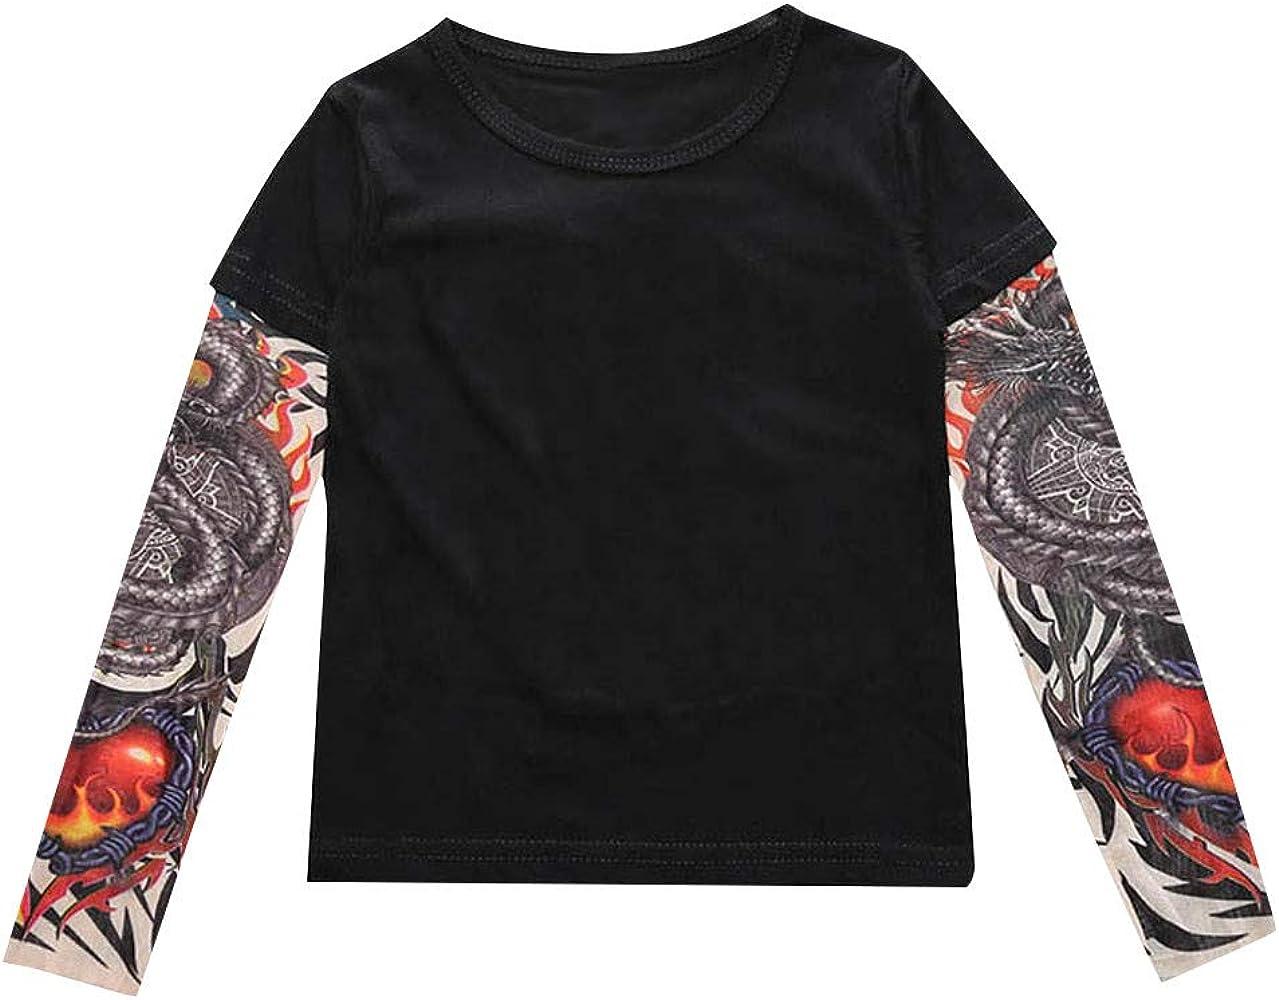 Newborn Toddler Baby Kid Boy Tattoo Printed T-Shirt Mesh Long Sleeve Romper Tops